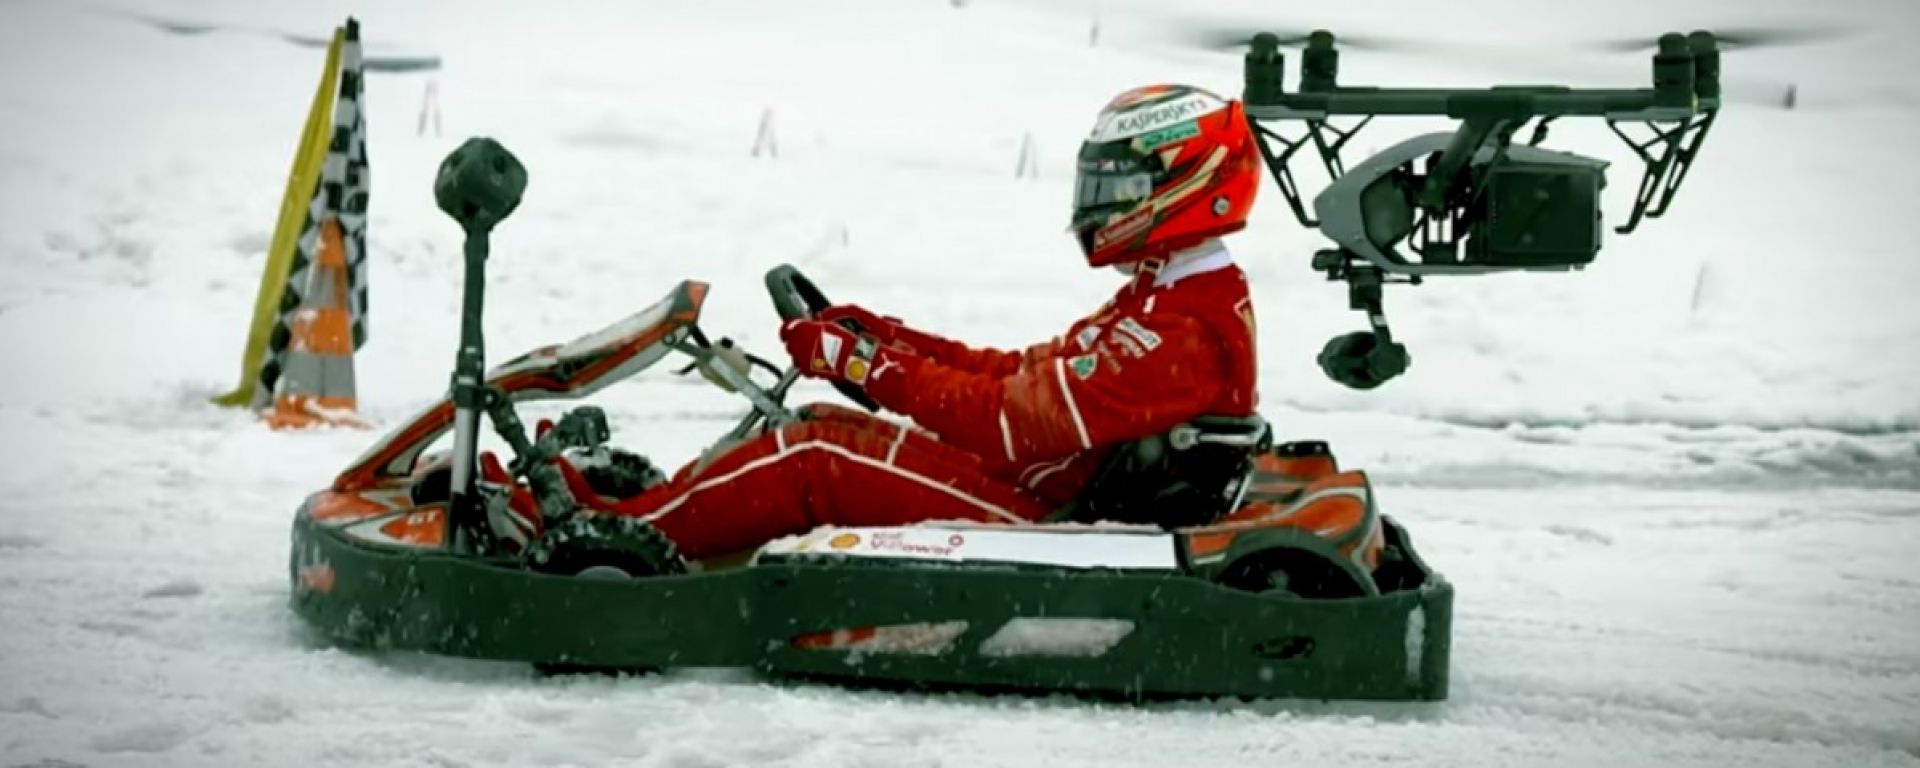 Kimi Raikkonen contro drone